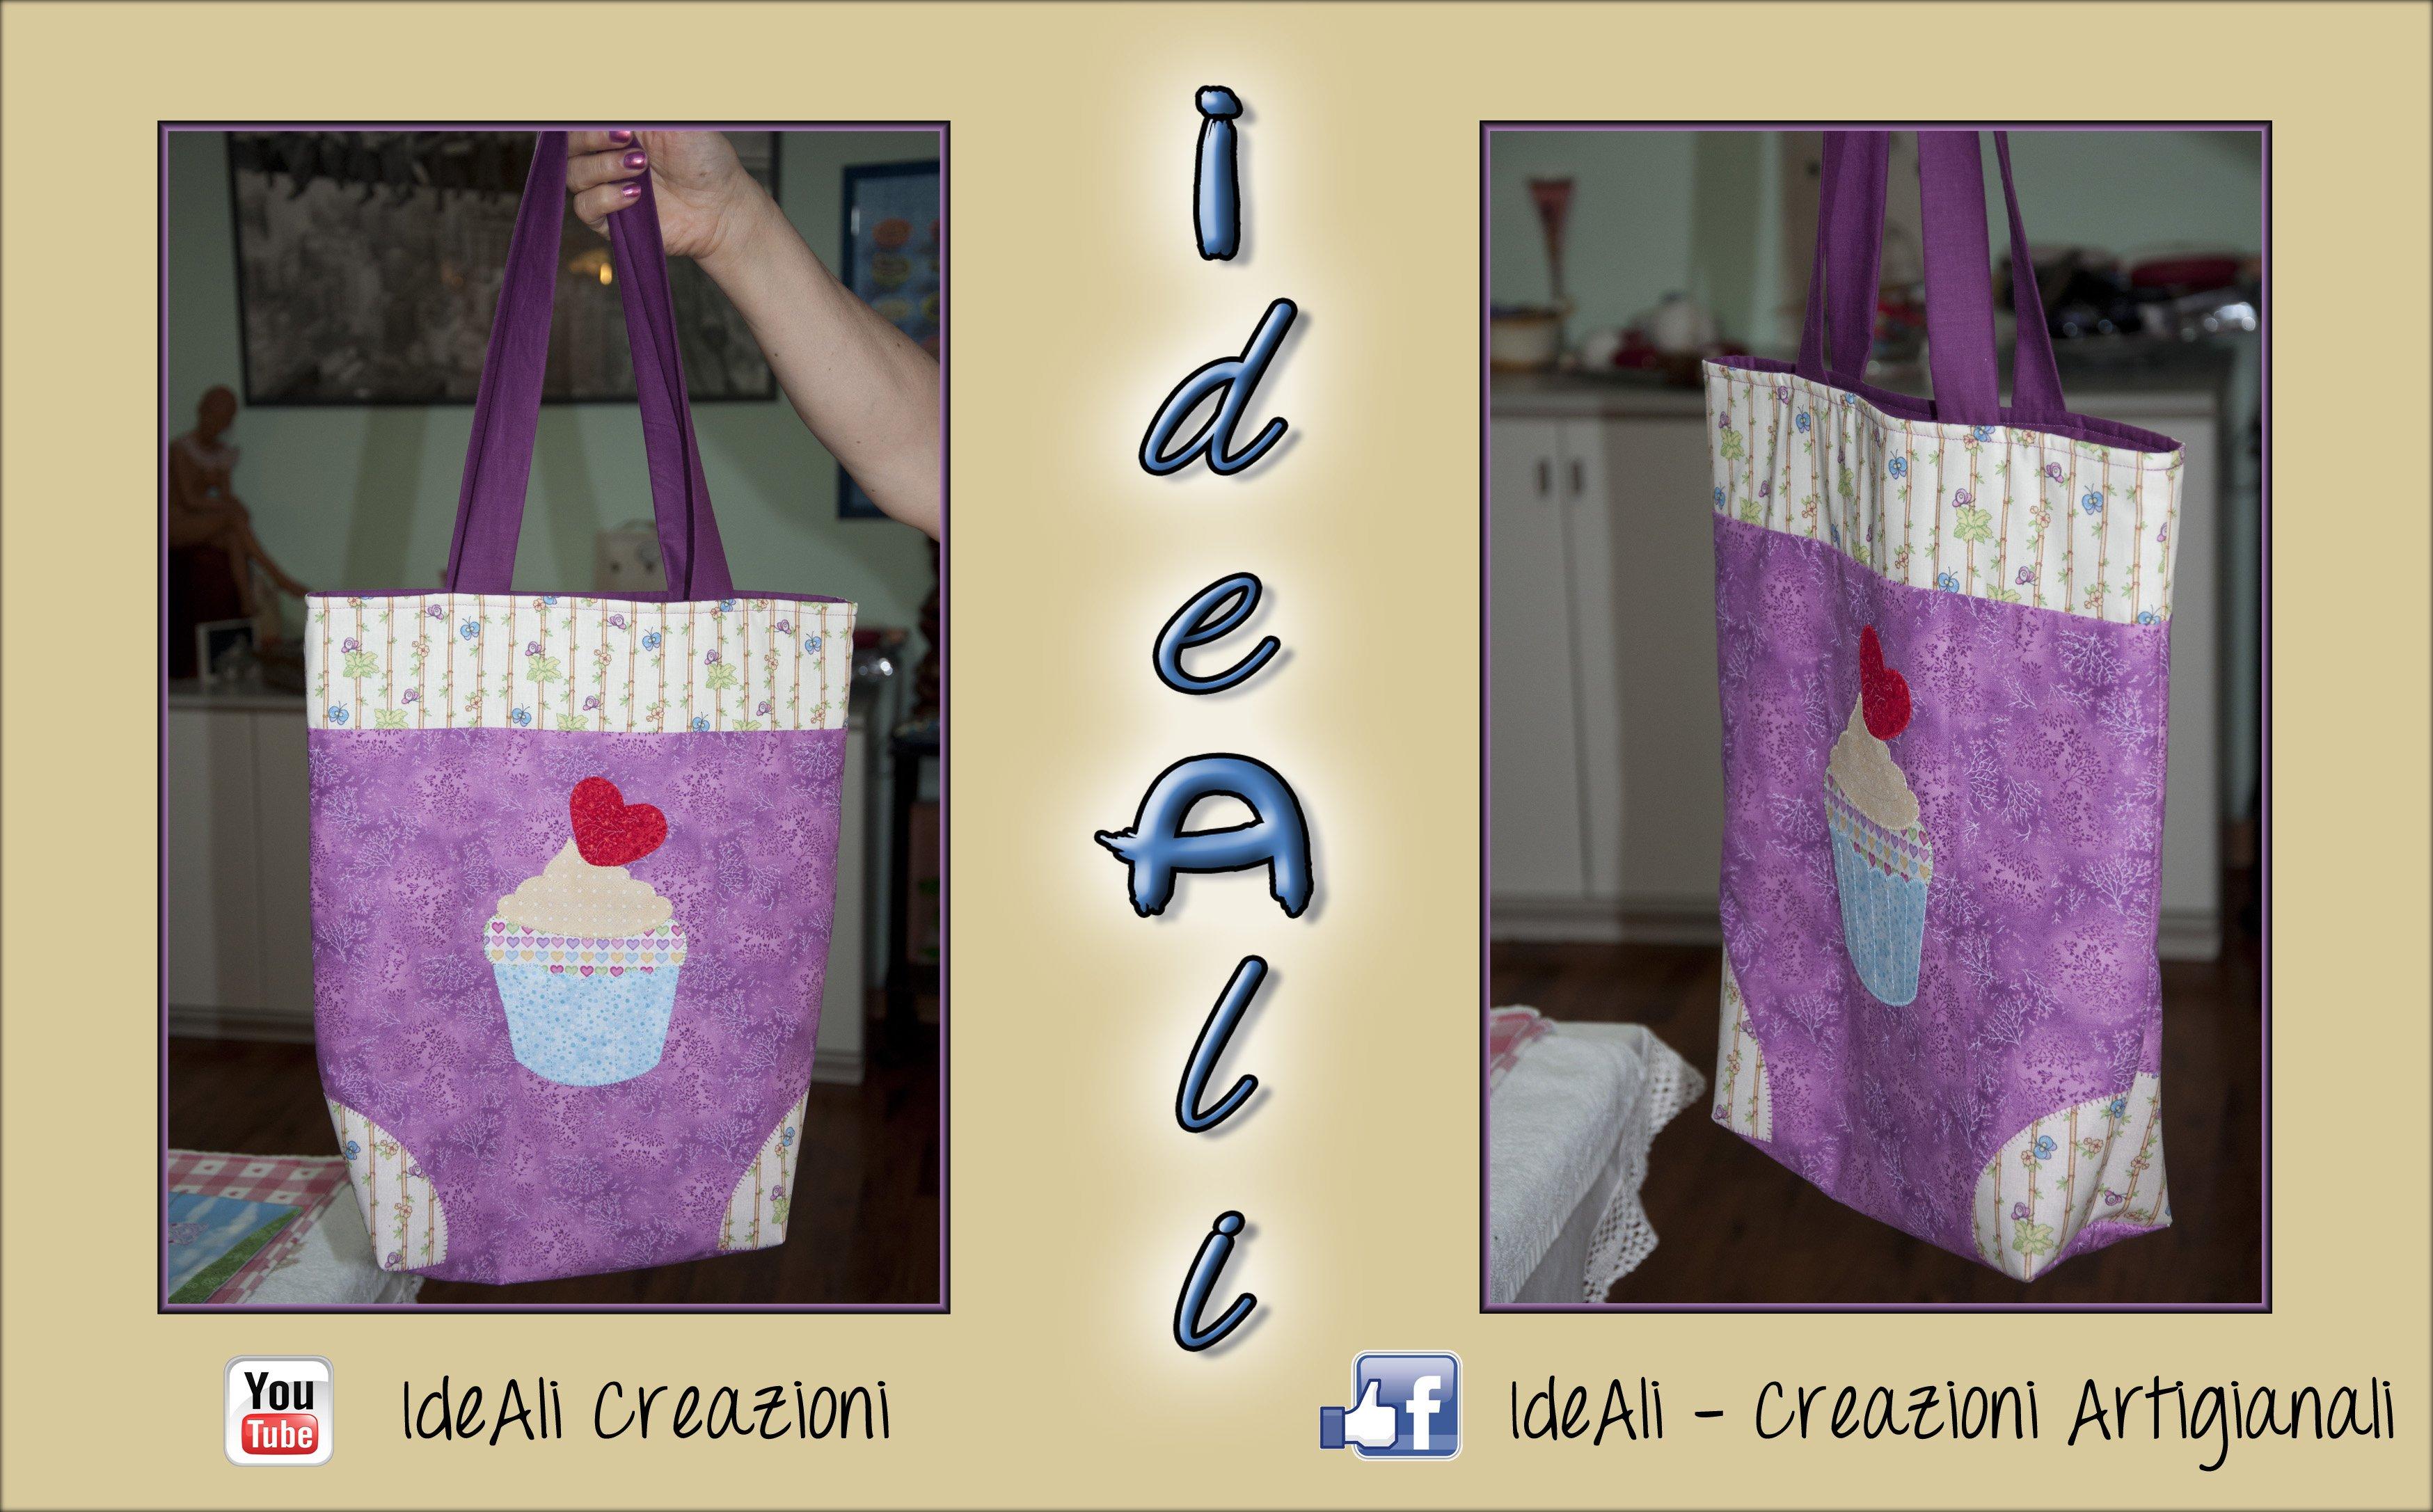 IdeAli - Shopper